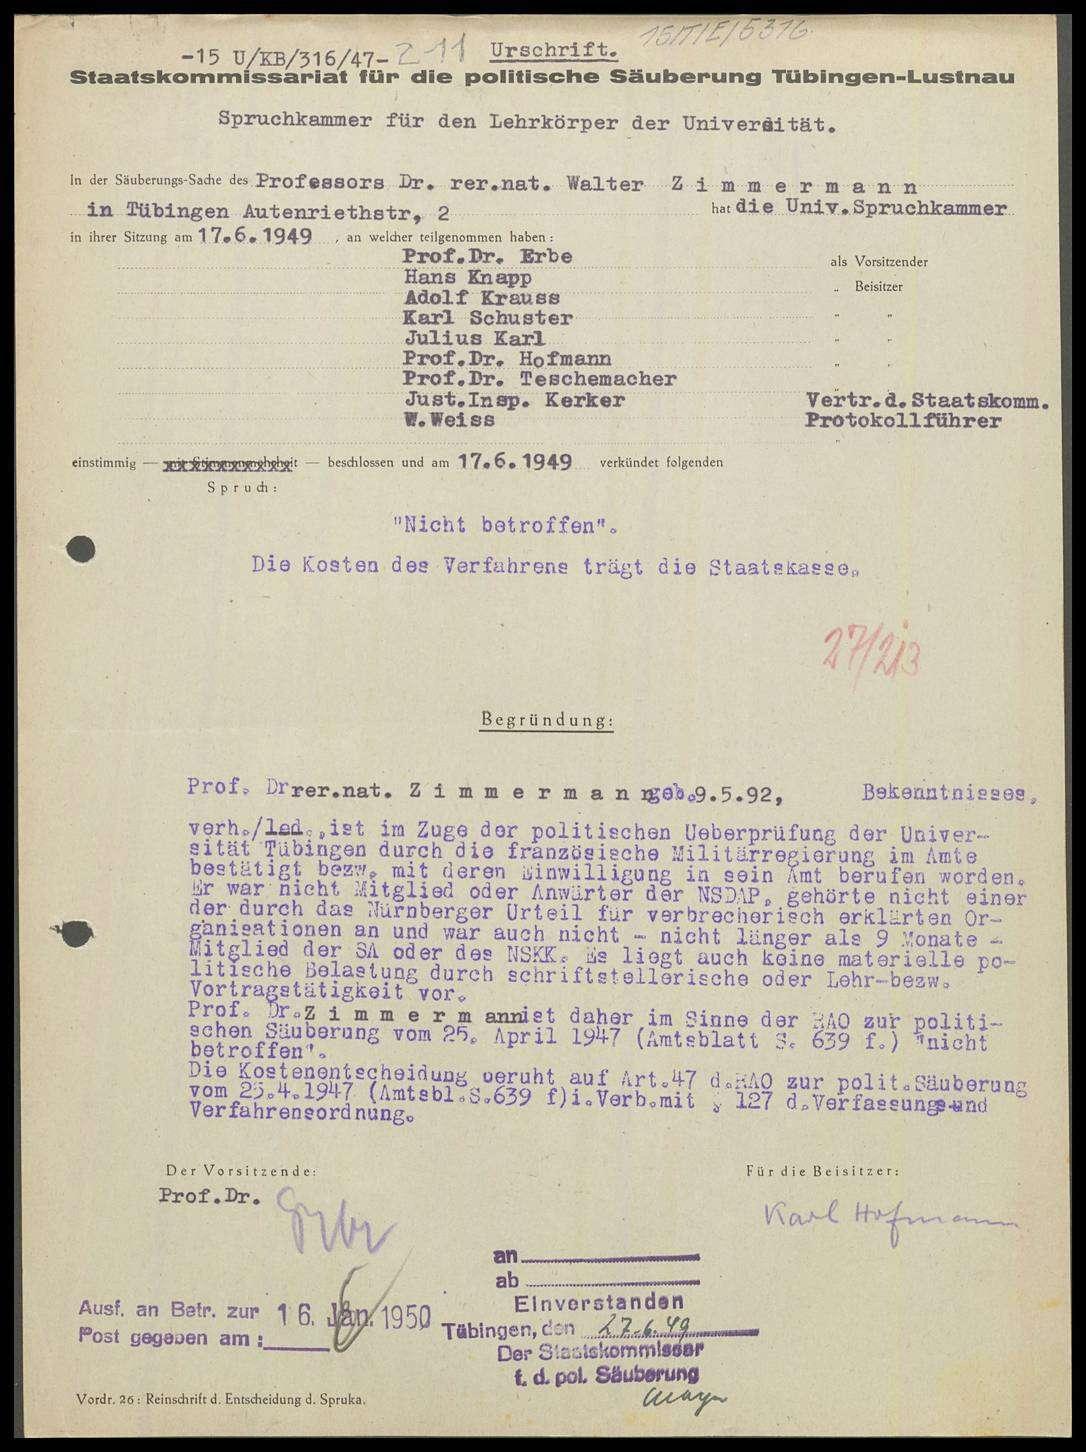 Zimmermann, Walter, Dr. rer. nat., Bild 1